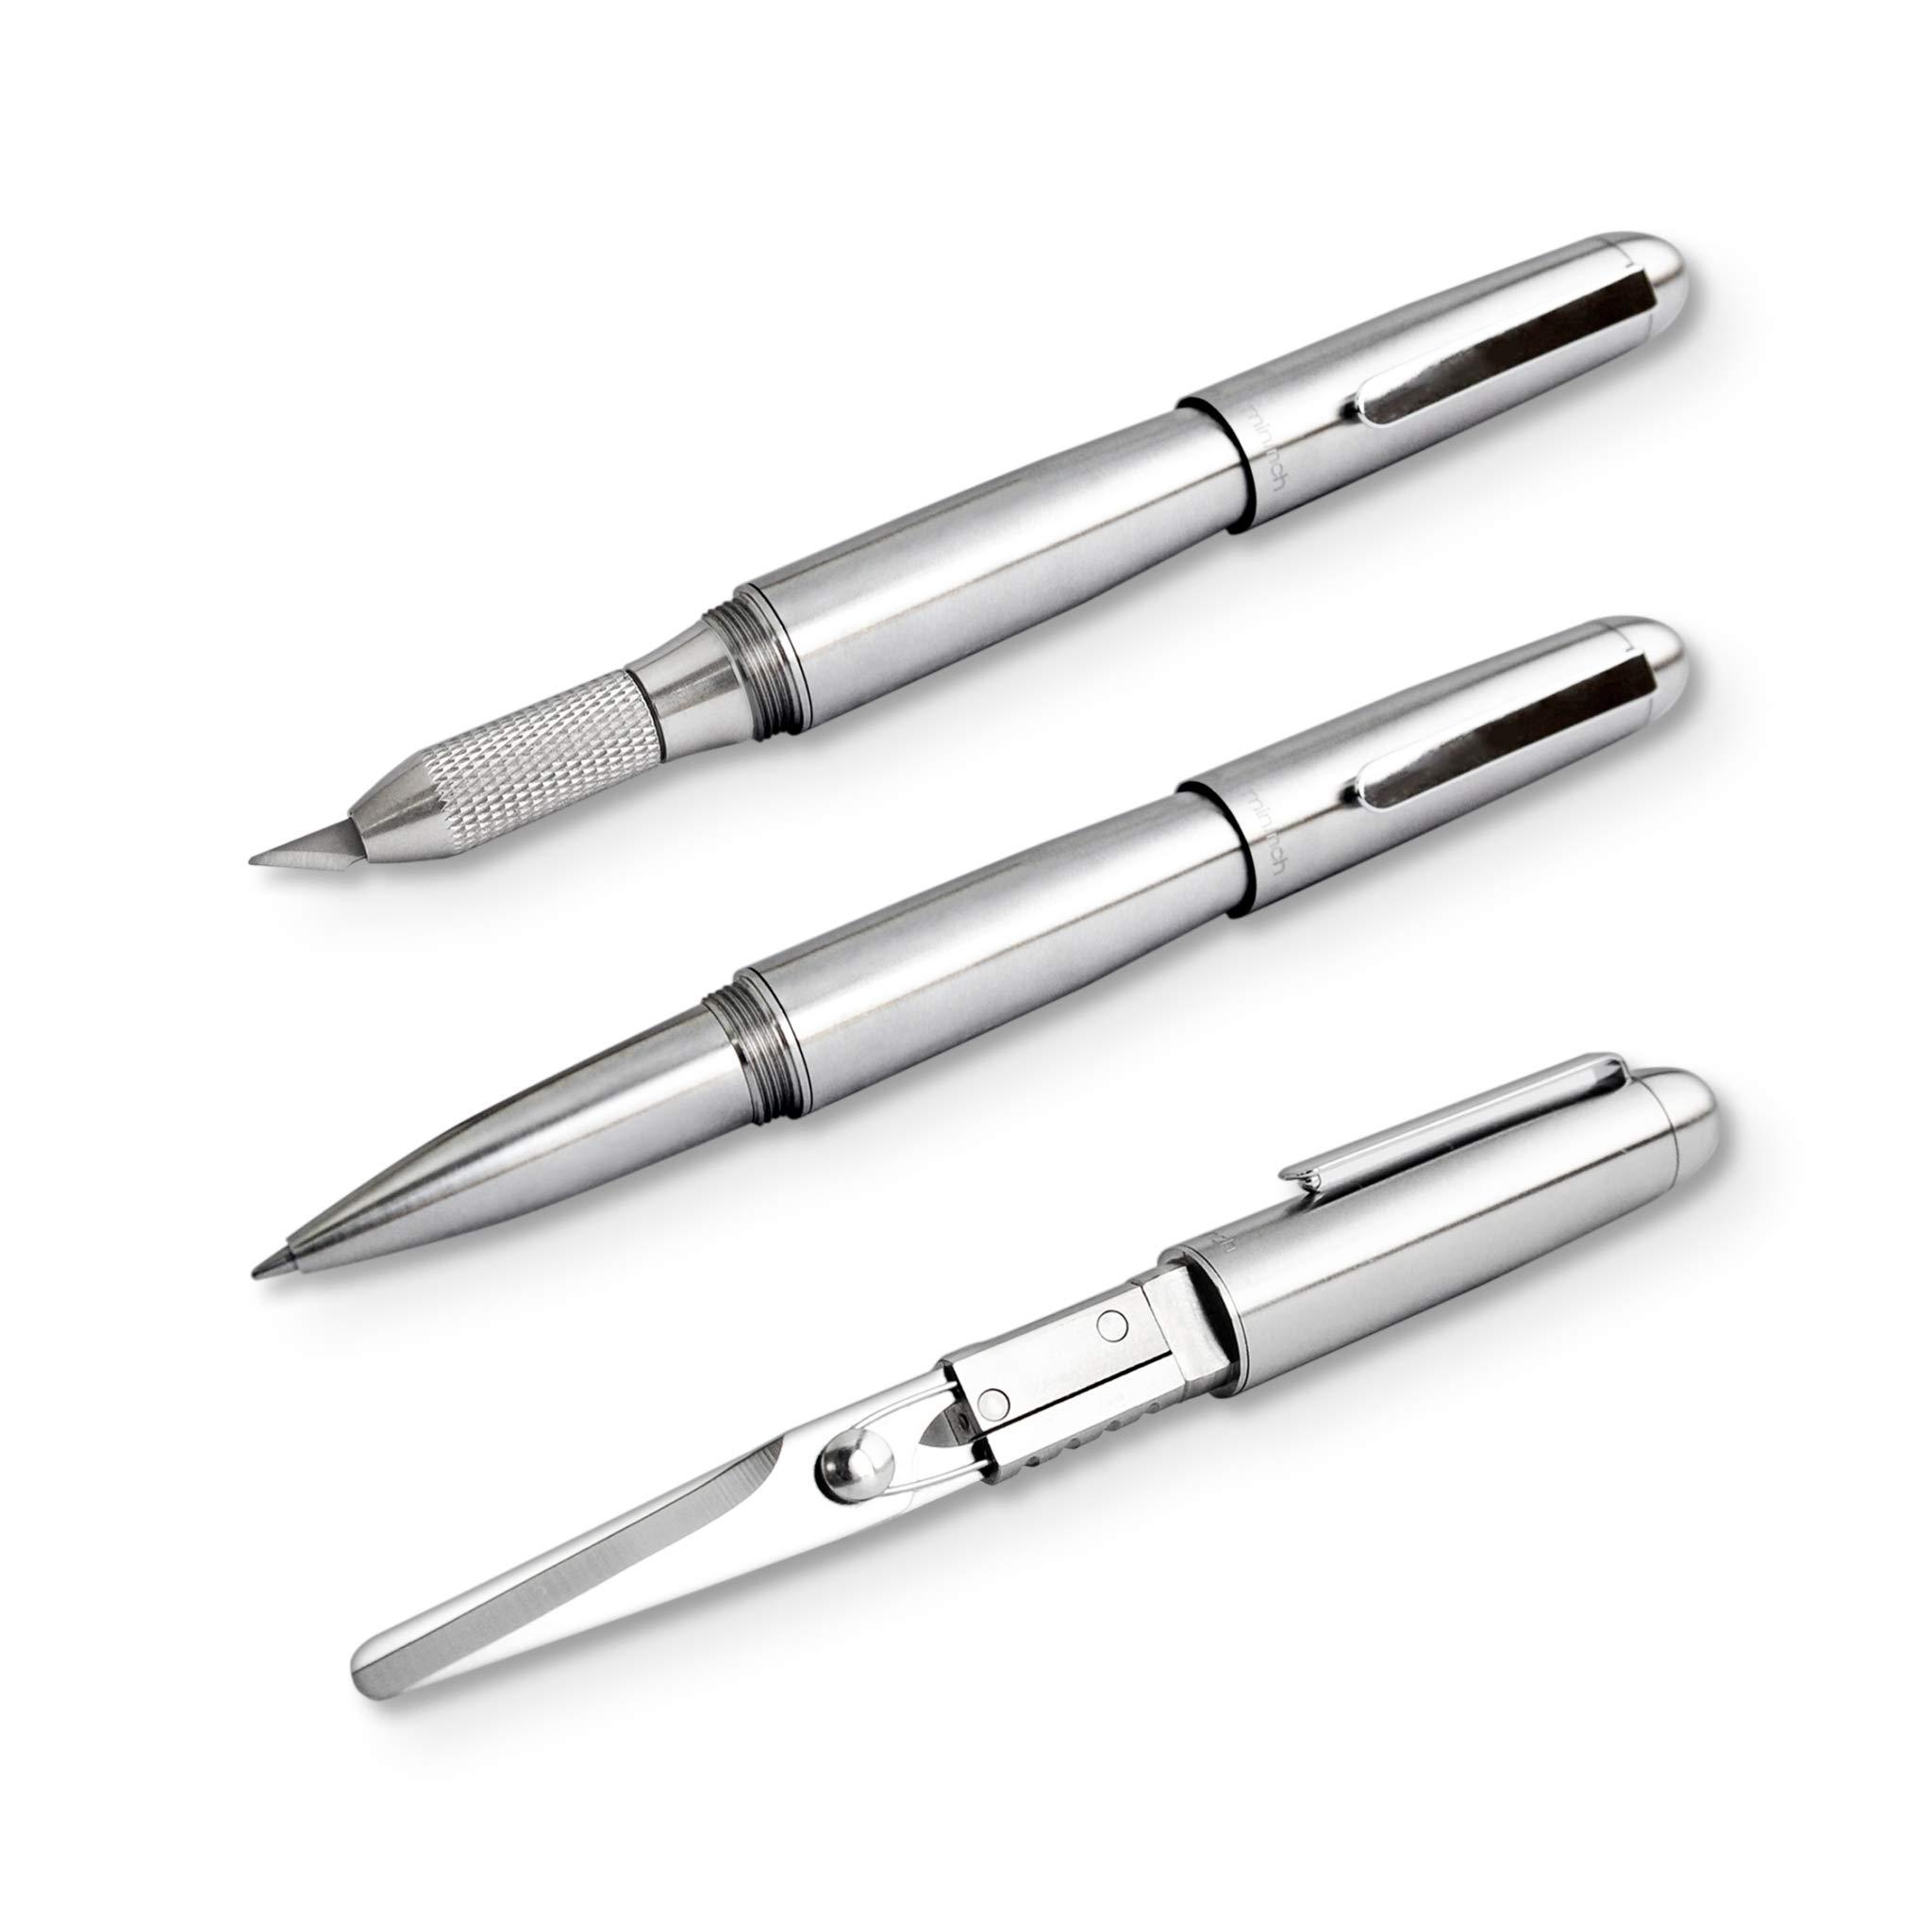 Xcissor Pen by Mininch | Multi-Tool Writing Utensil with Hidden Scissors | Optional Precision Razor Blade (Full Set, Silver)